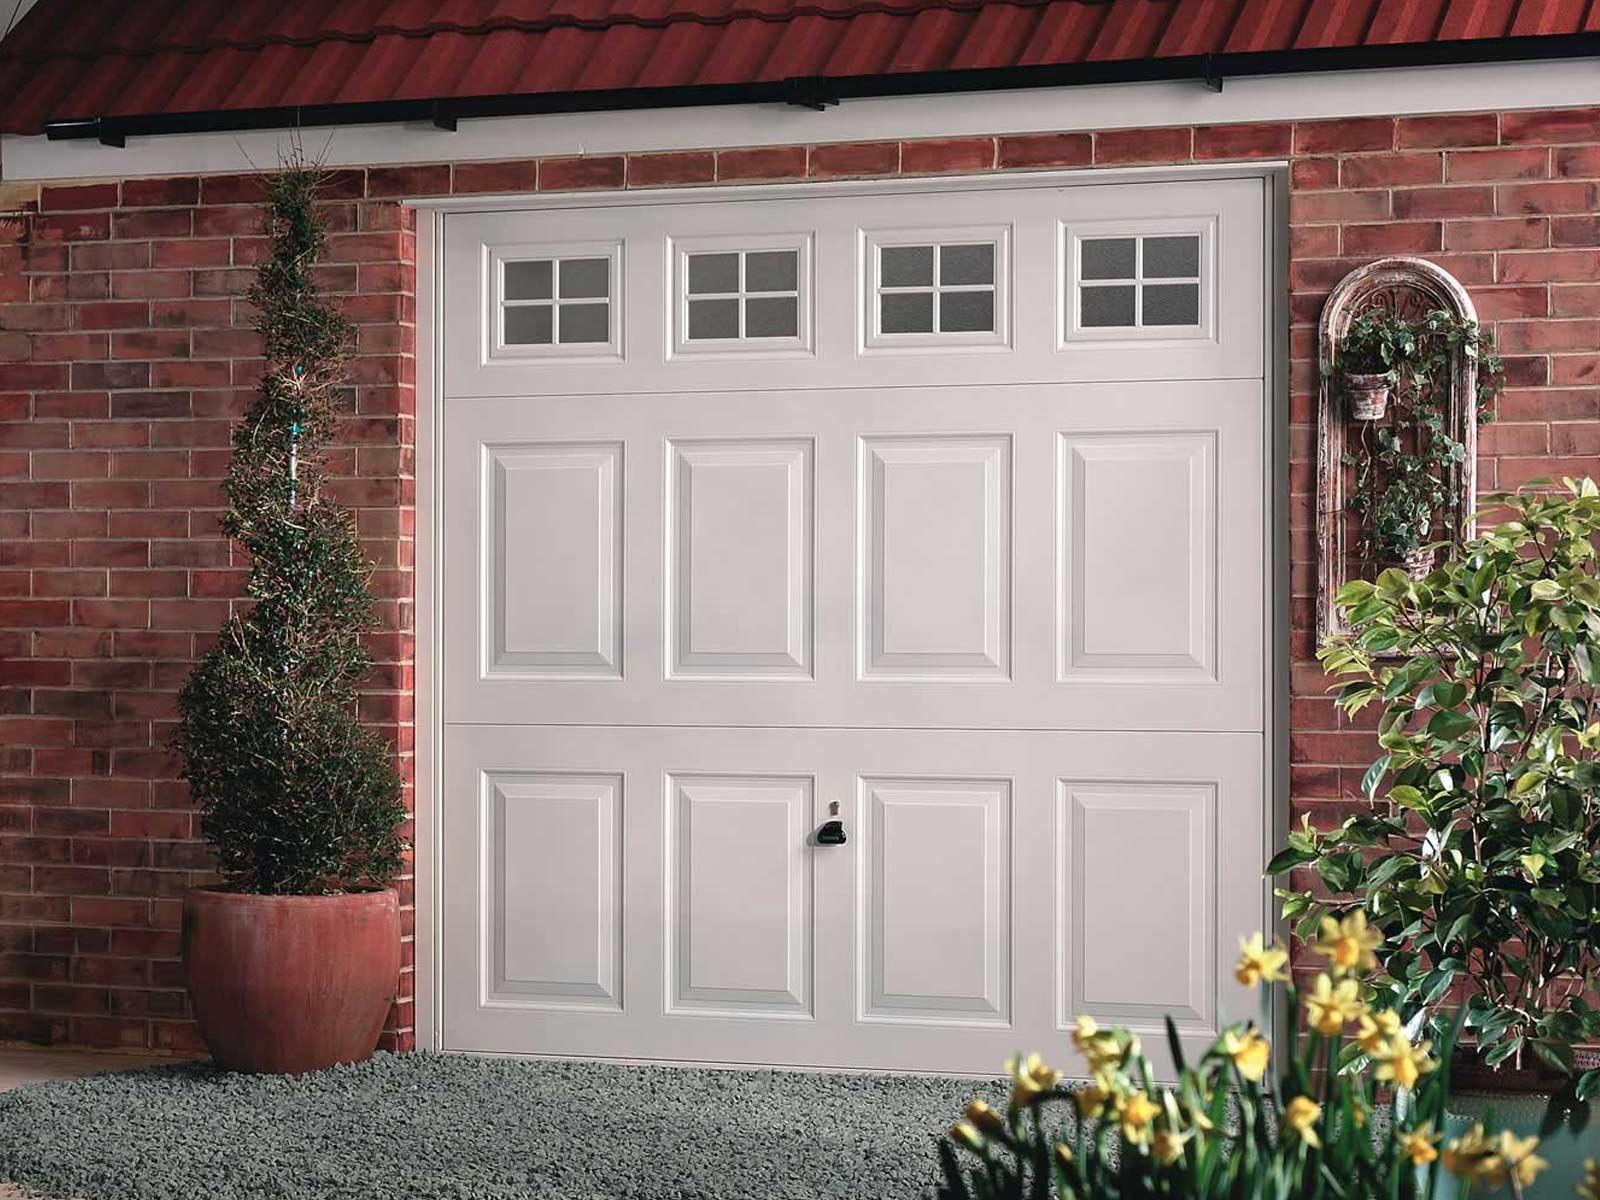 Garador up and over canopy garage doors shutter spec direct garador beaumont up and over canopy garage doors rubansaba